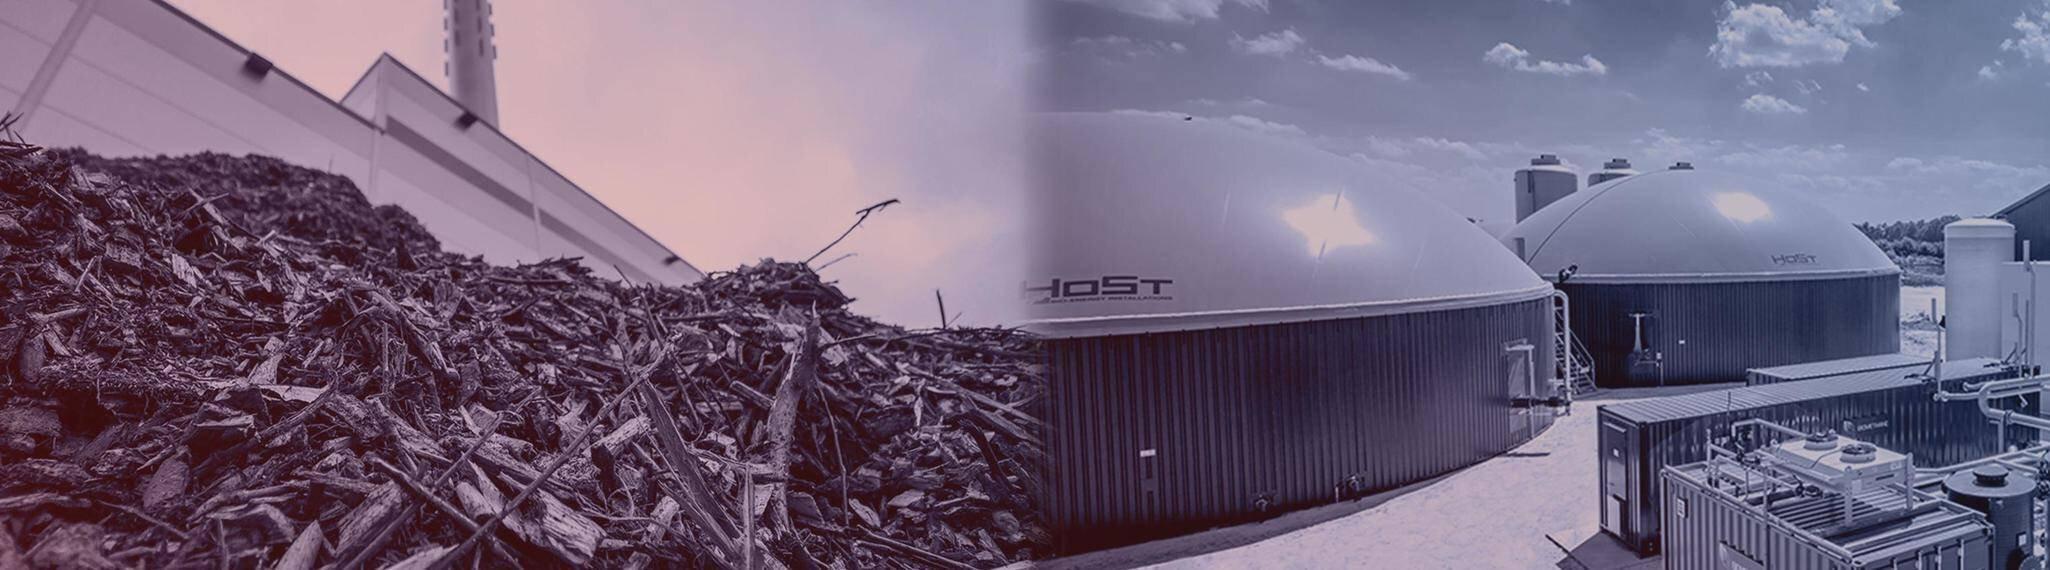 Company banner of HoSt Bioenergy